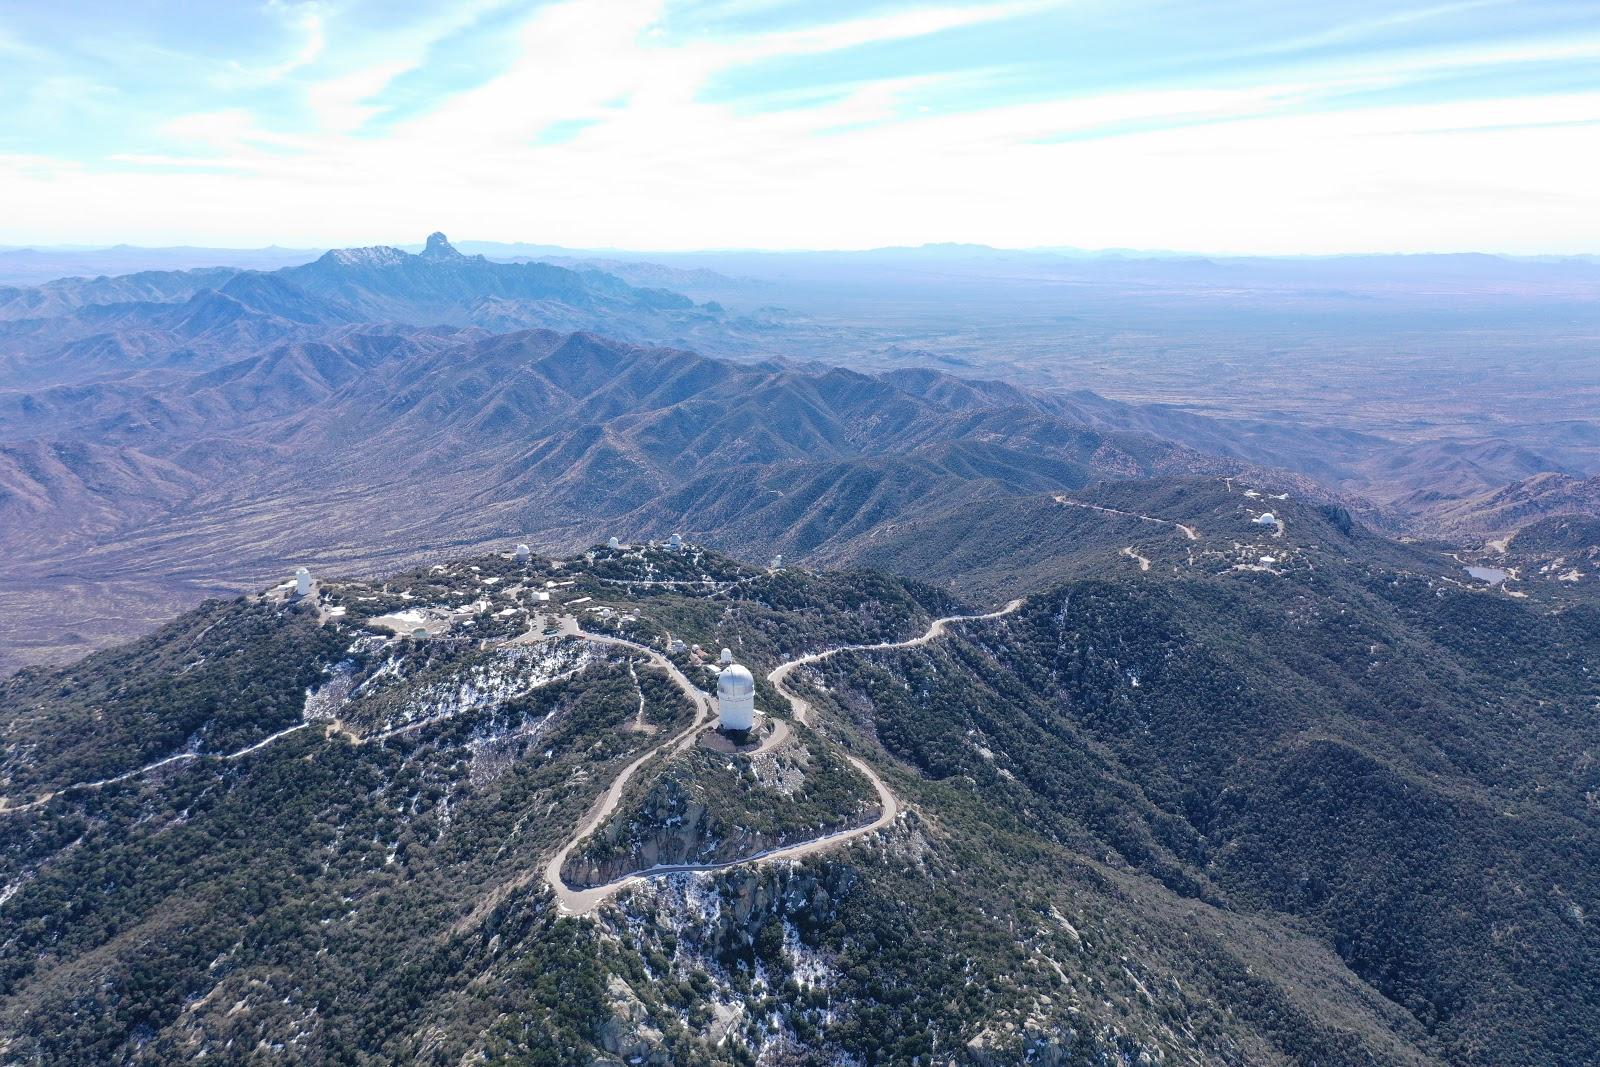 Cycling Kitt Peak, Tucson, AZ - one of Arizona's top road bike climbs.